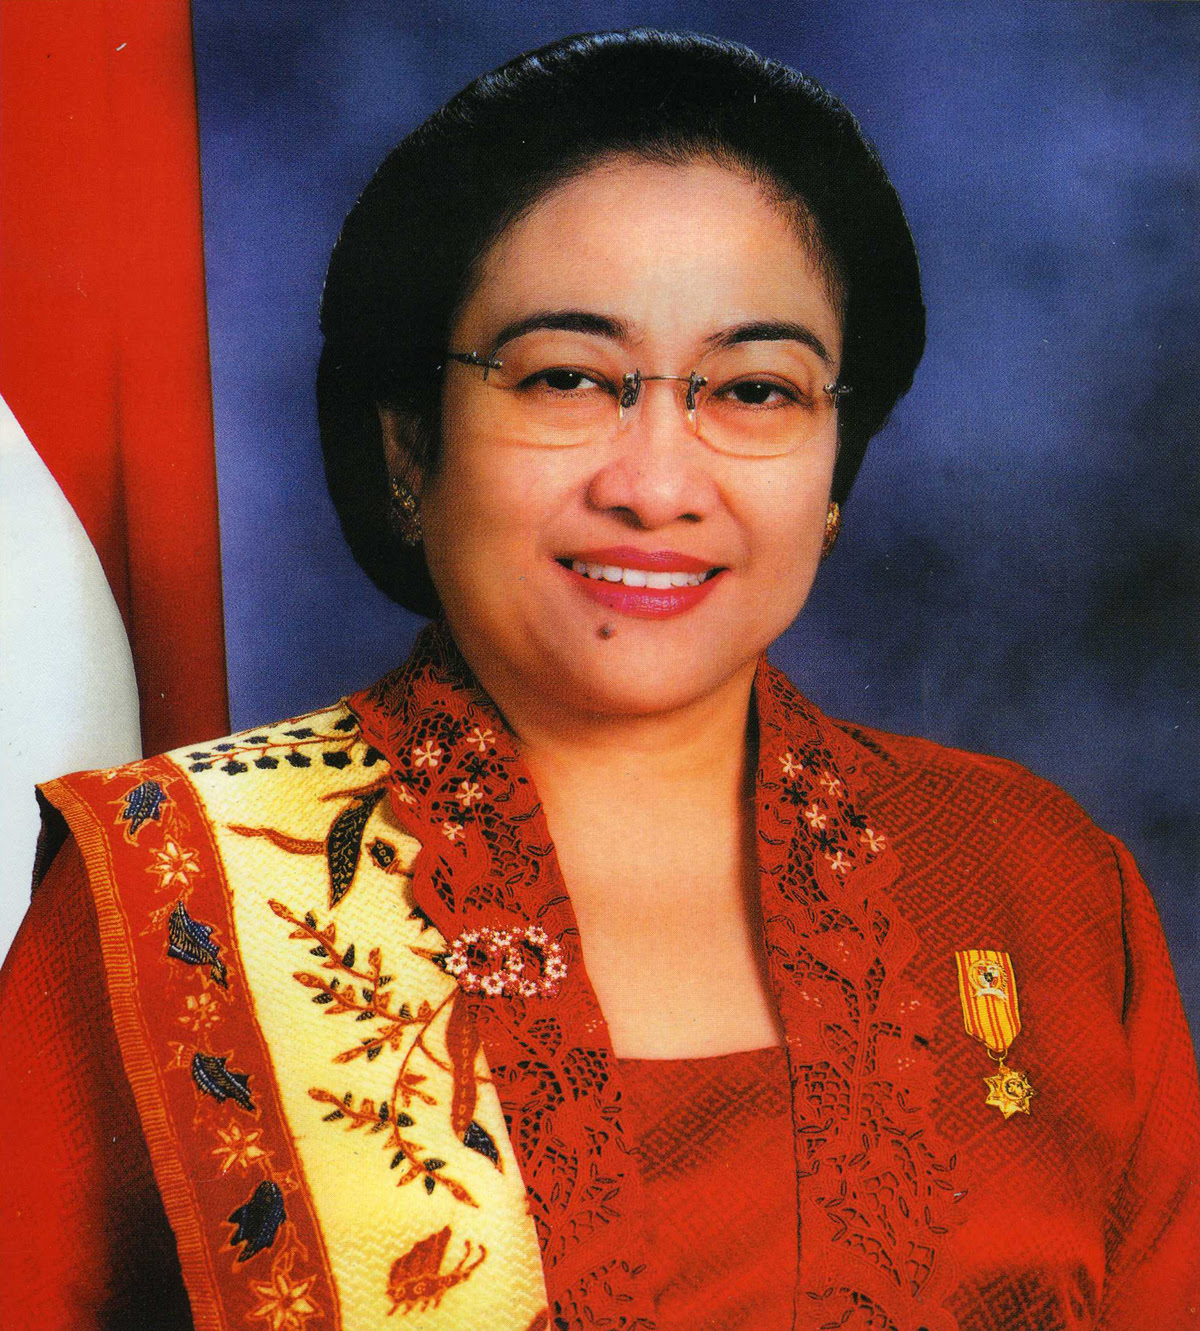 Kata Kata Bijak yang Aneh Megawati